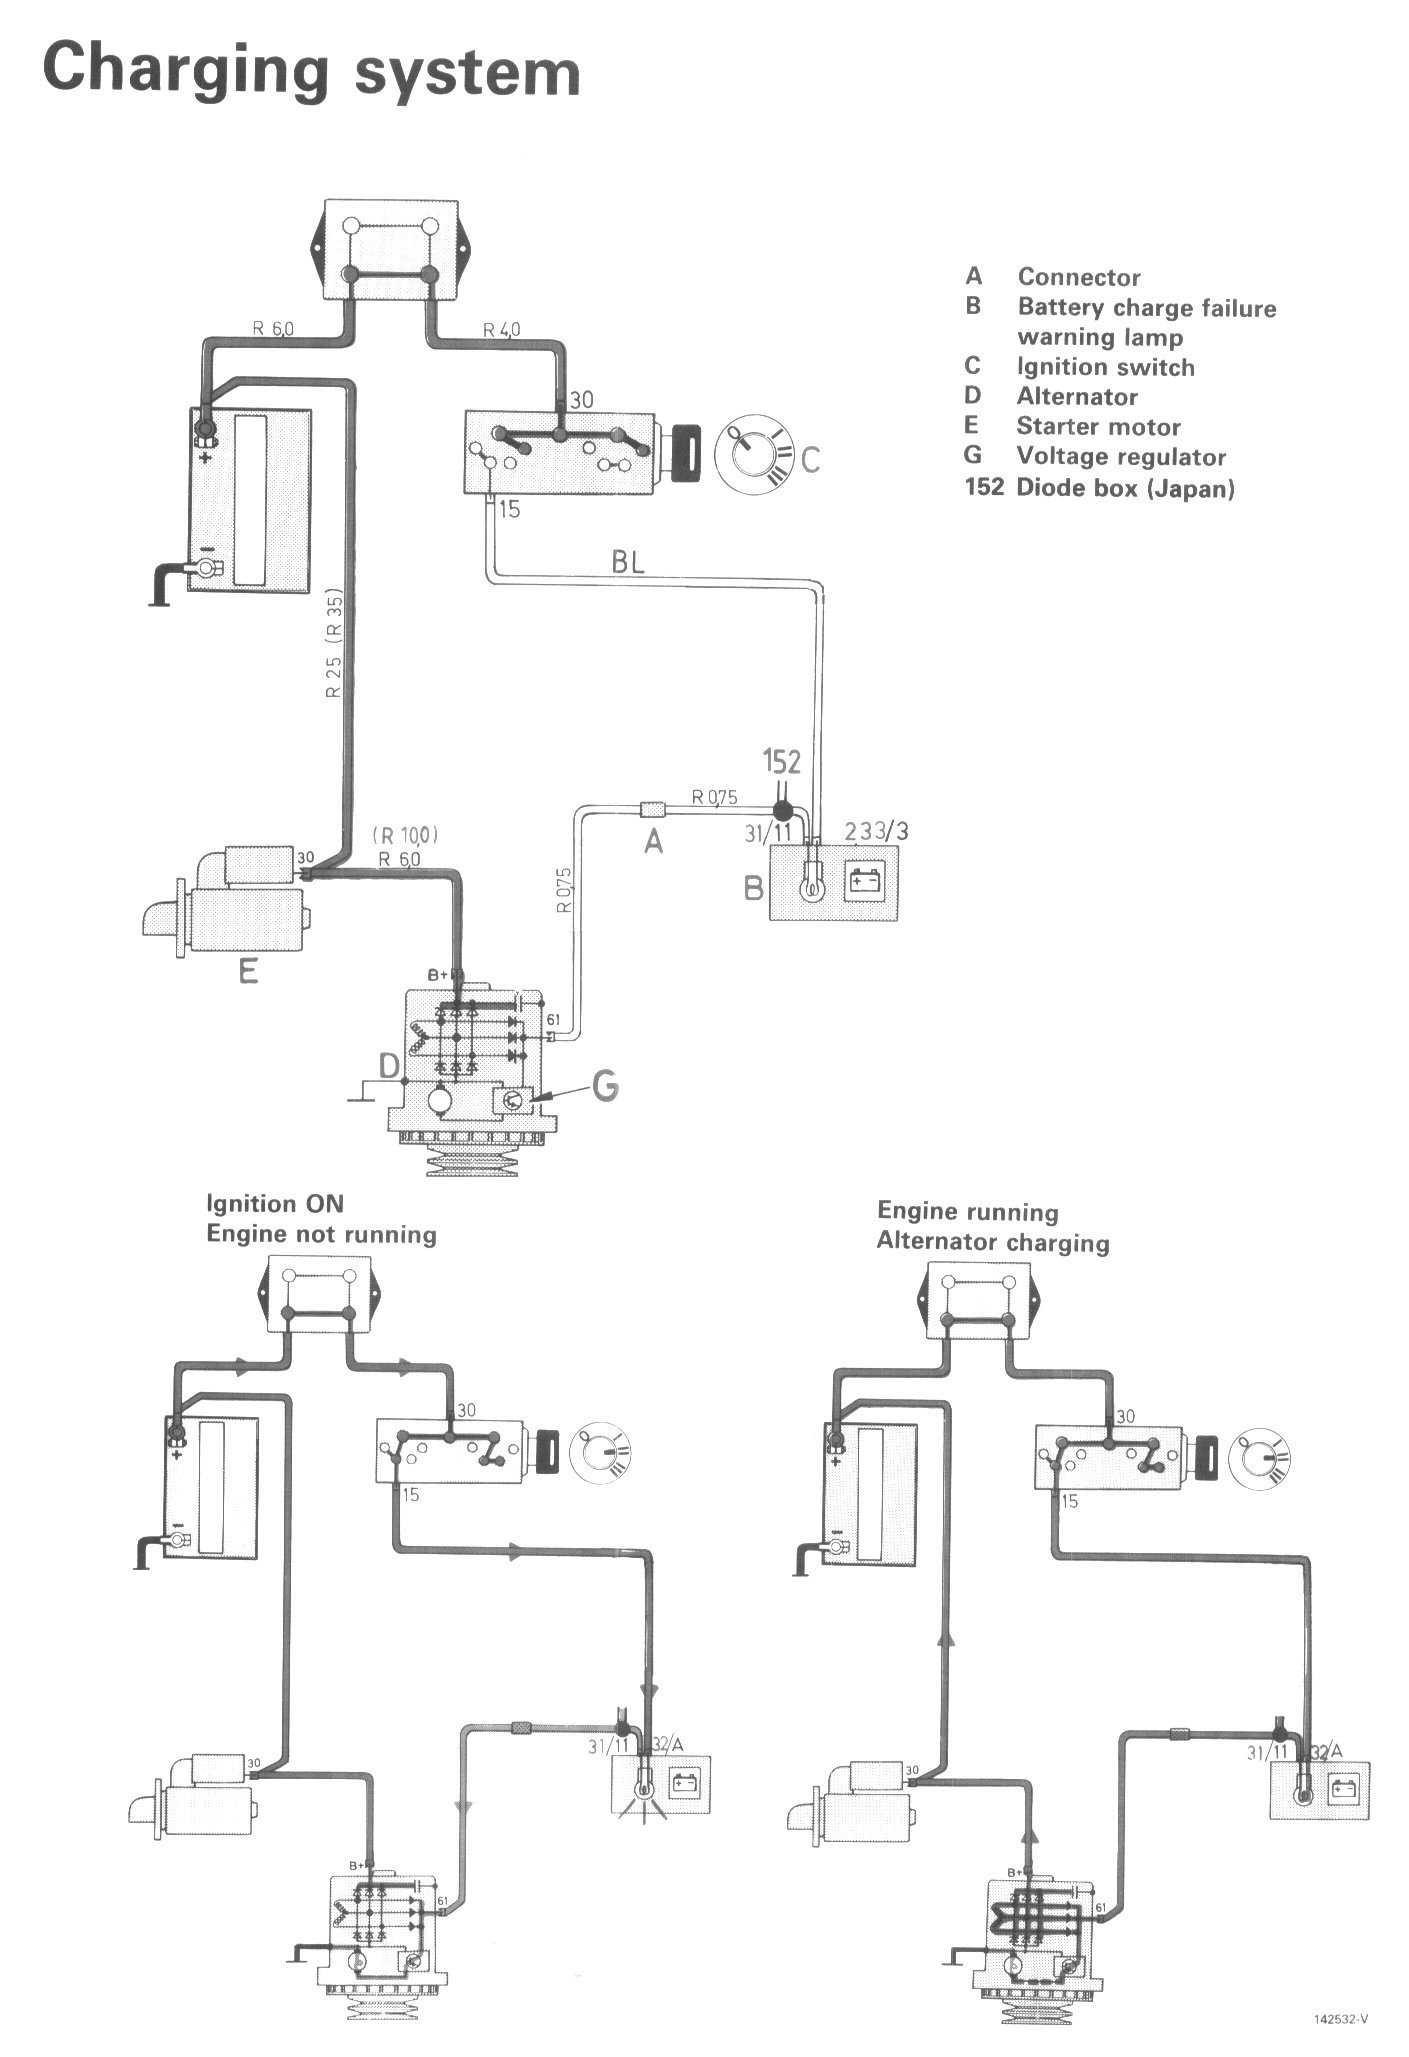 Volvo 240 Engine Diagram 240 Wiring Diagram 1984 Volvo Smart Wiring Diagrams • Of Volvo 240 Engine Diagram